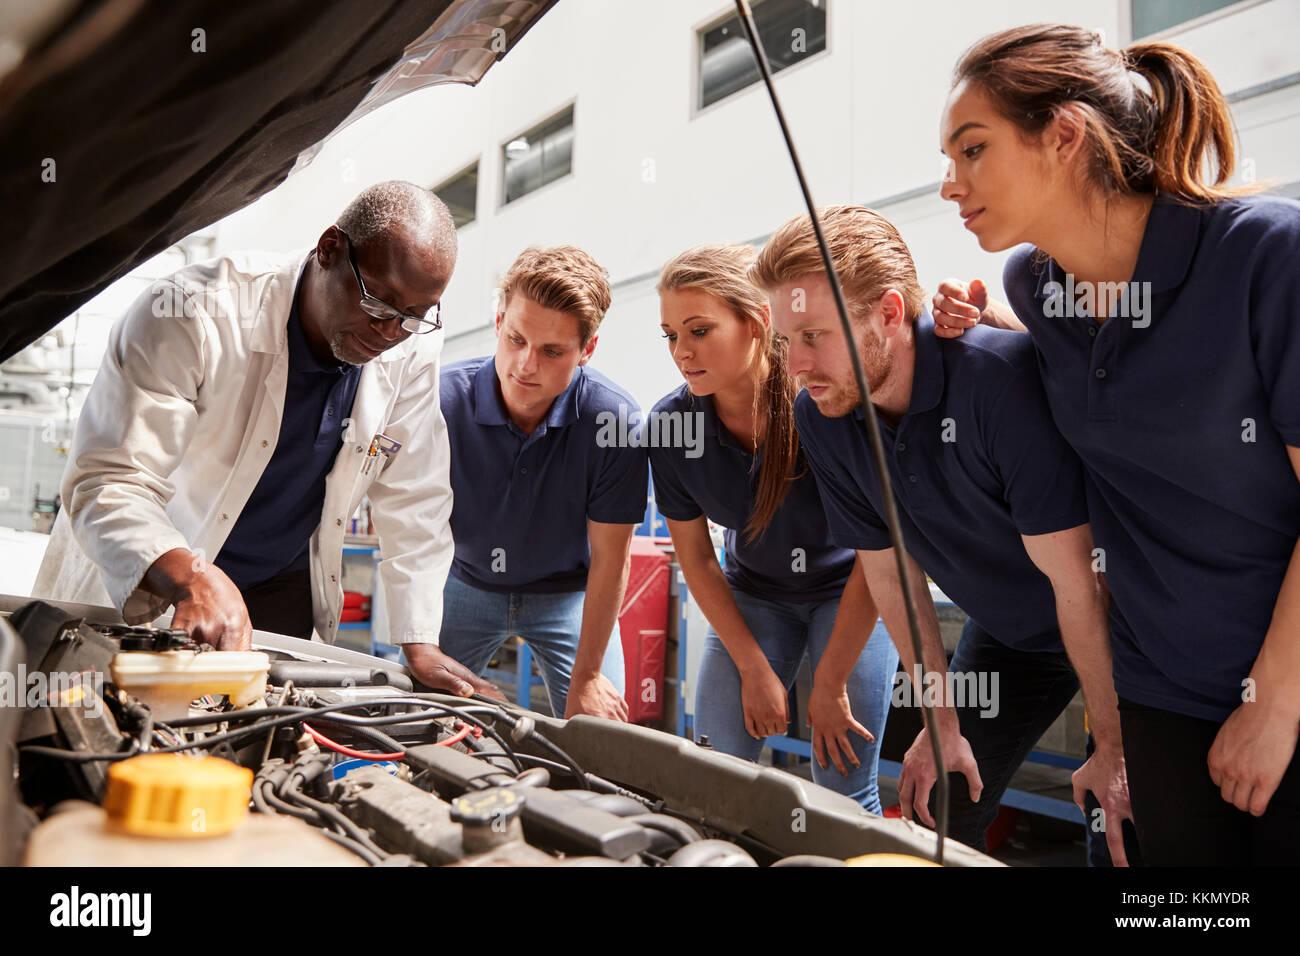 Mechanic instructing trainees around a car engine, low angle - Stock Image